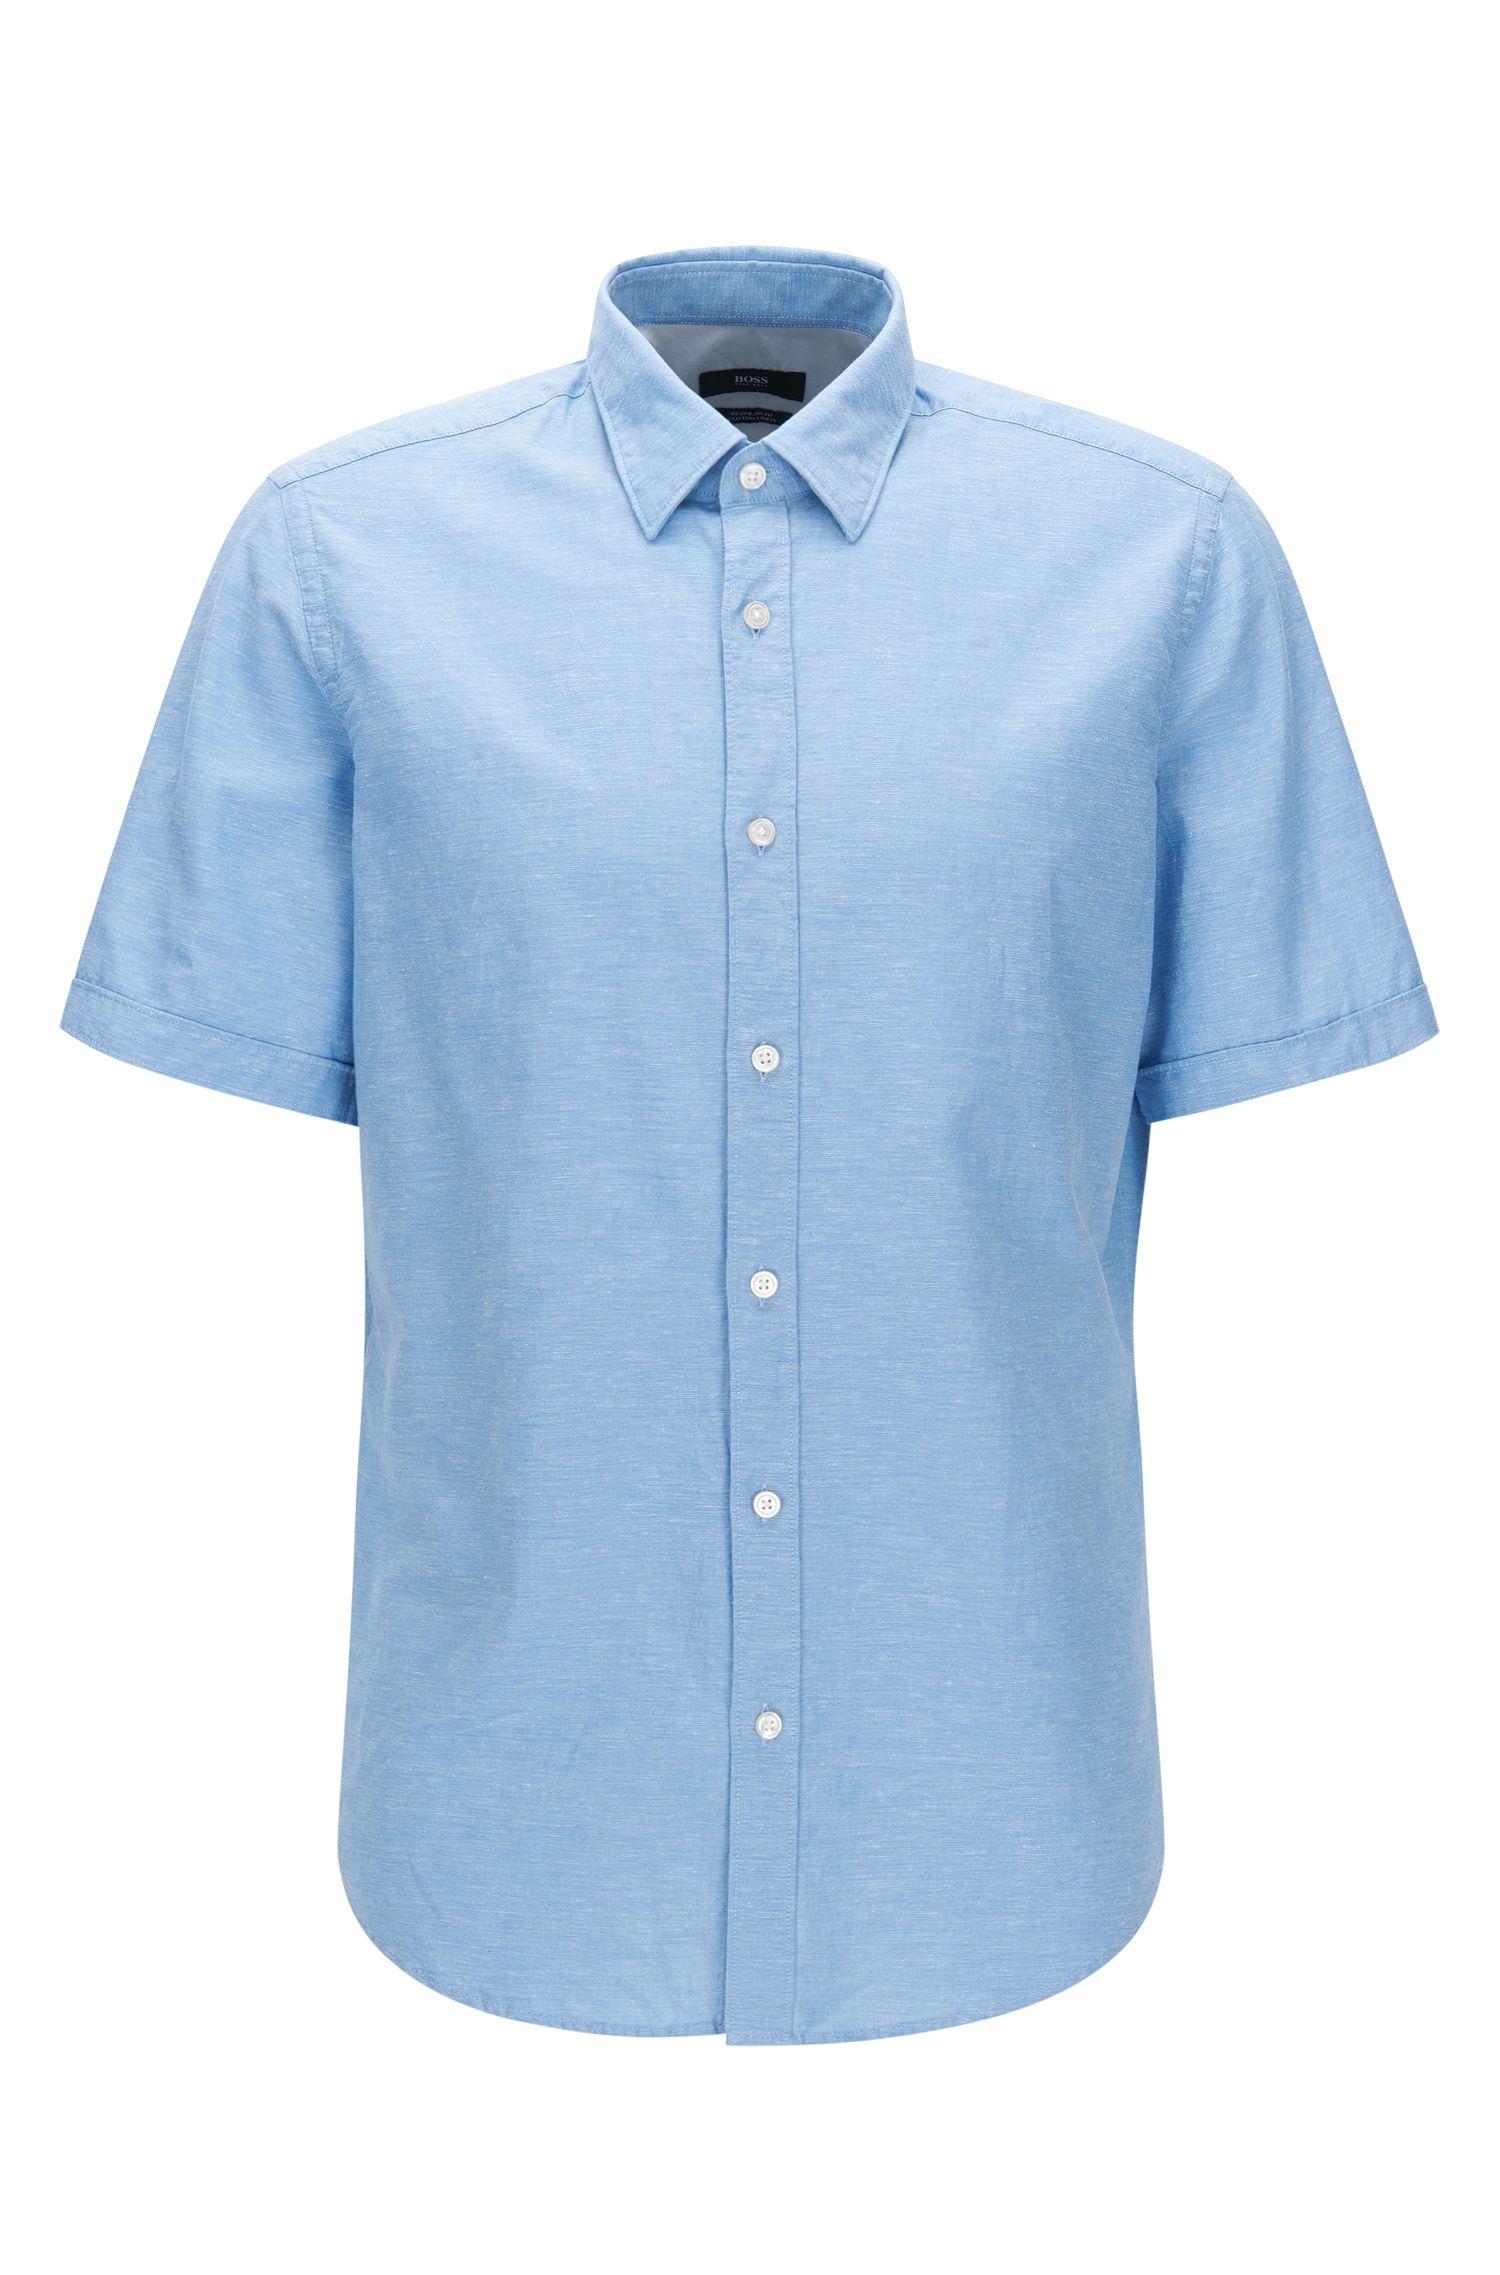 Regular-fit short-sleeved cotton shirt blended with linen